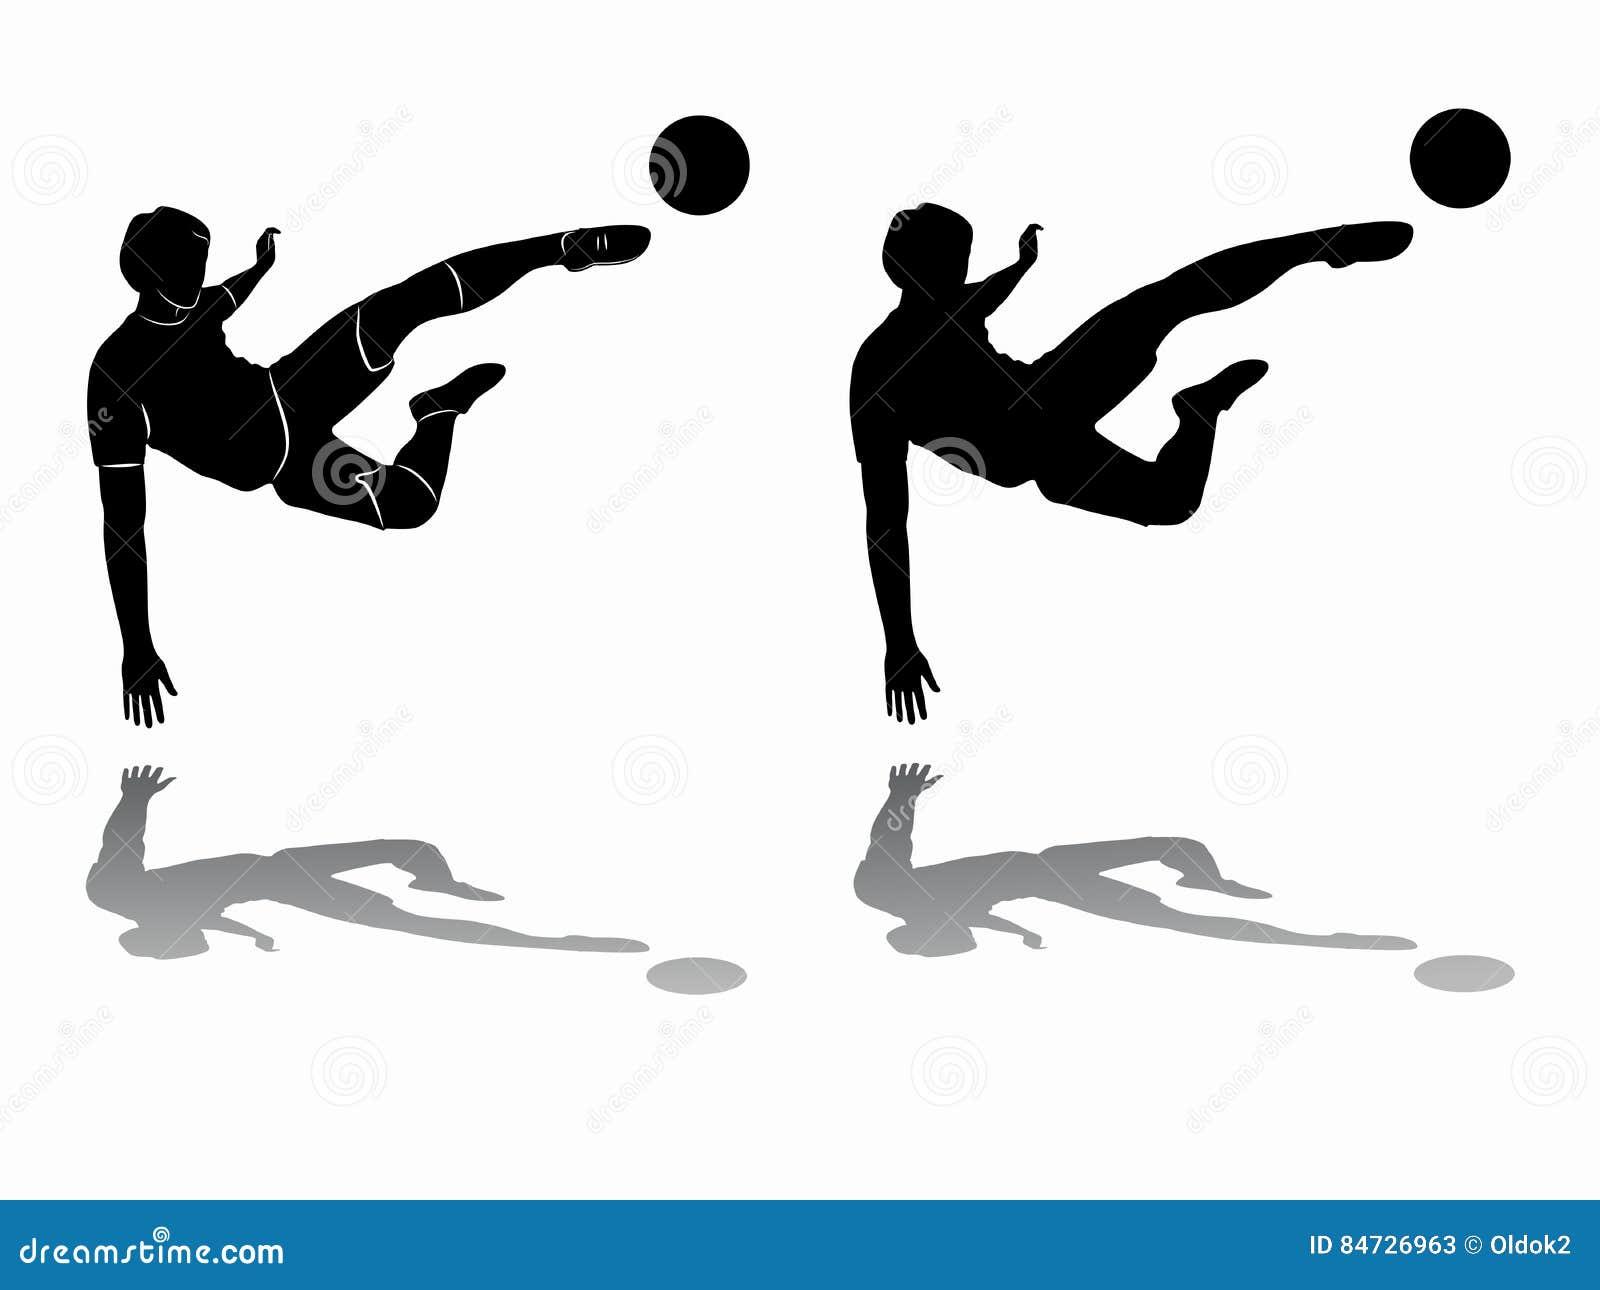 e8f0a9ea6 Silhouette Of Soccer Player, Vector Draw Stock Vector - Illustration ...